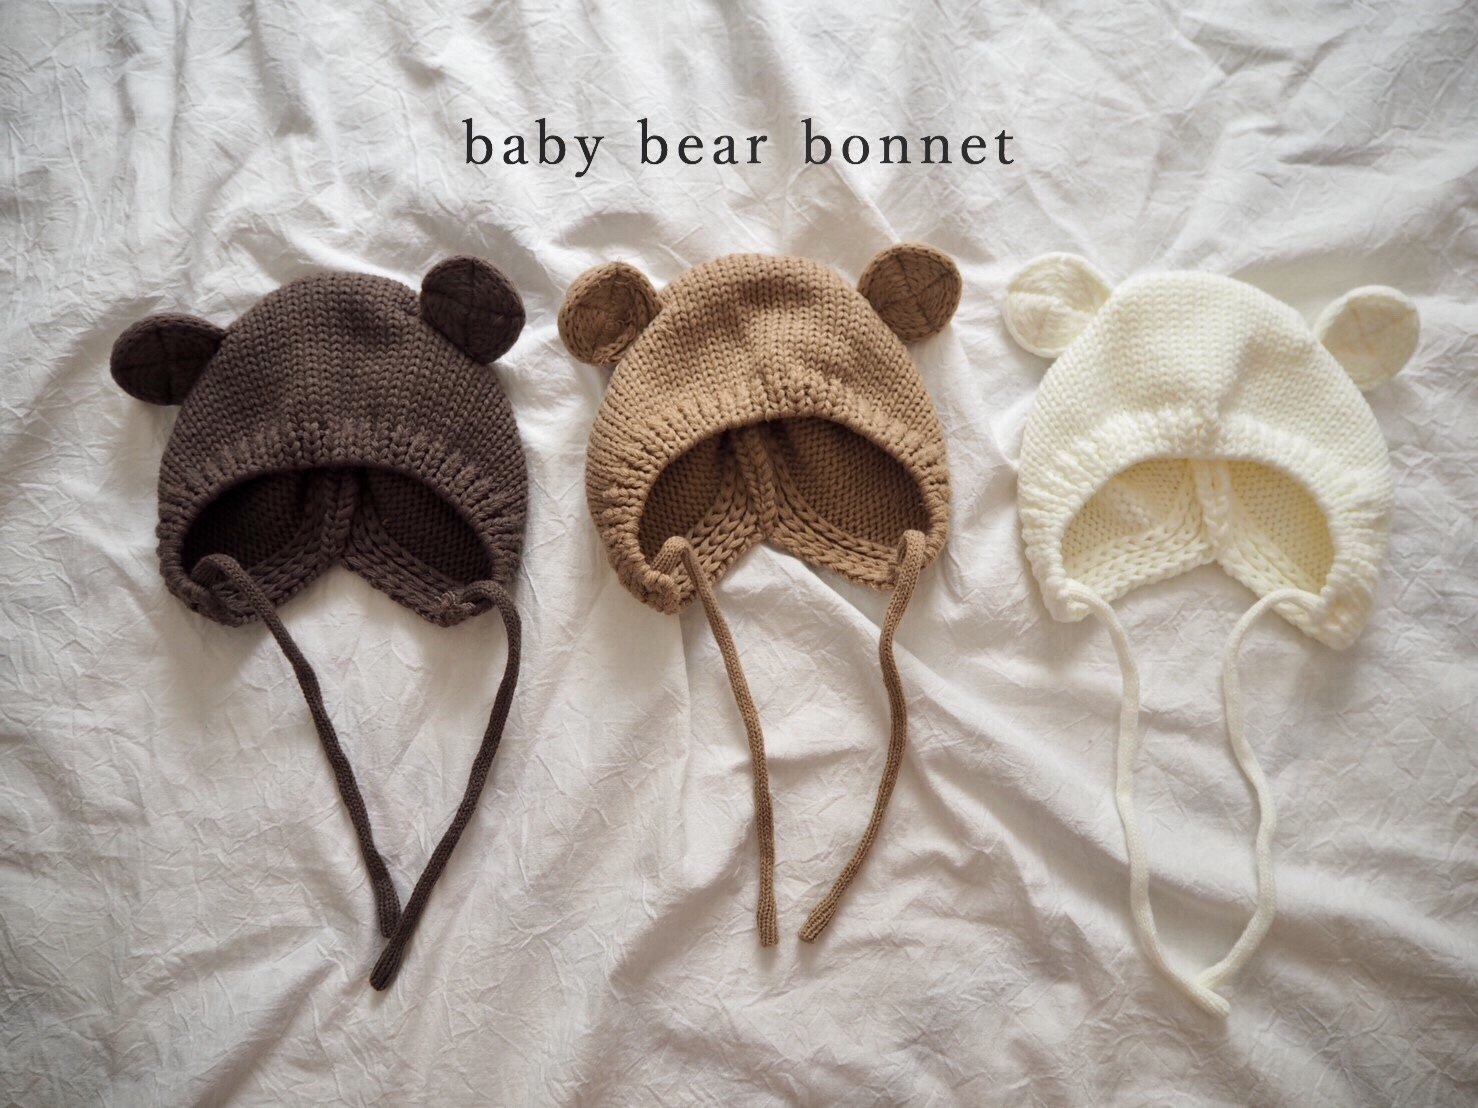 baby ベア ボンネット